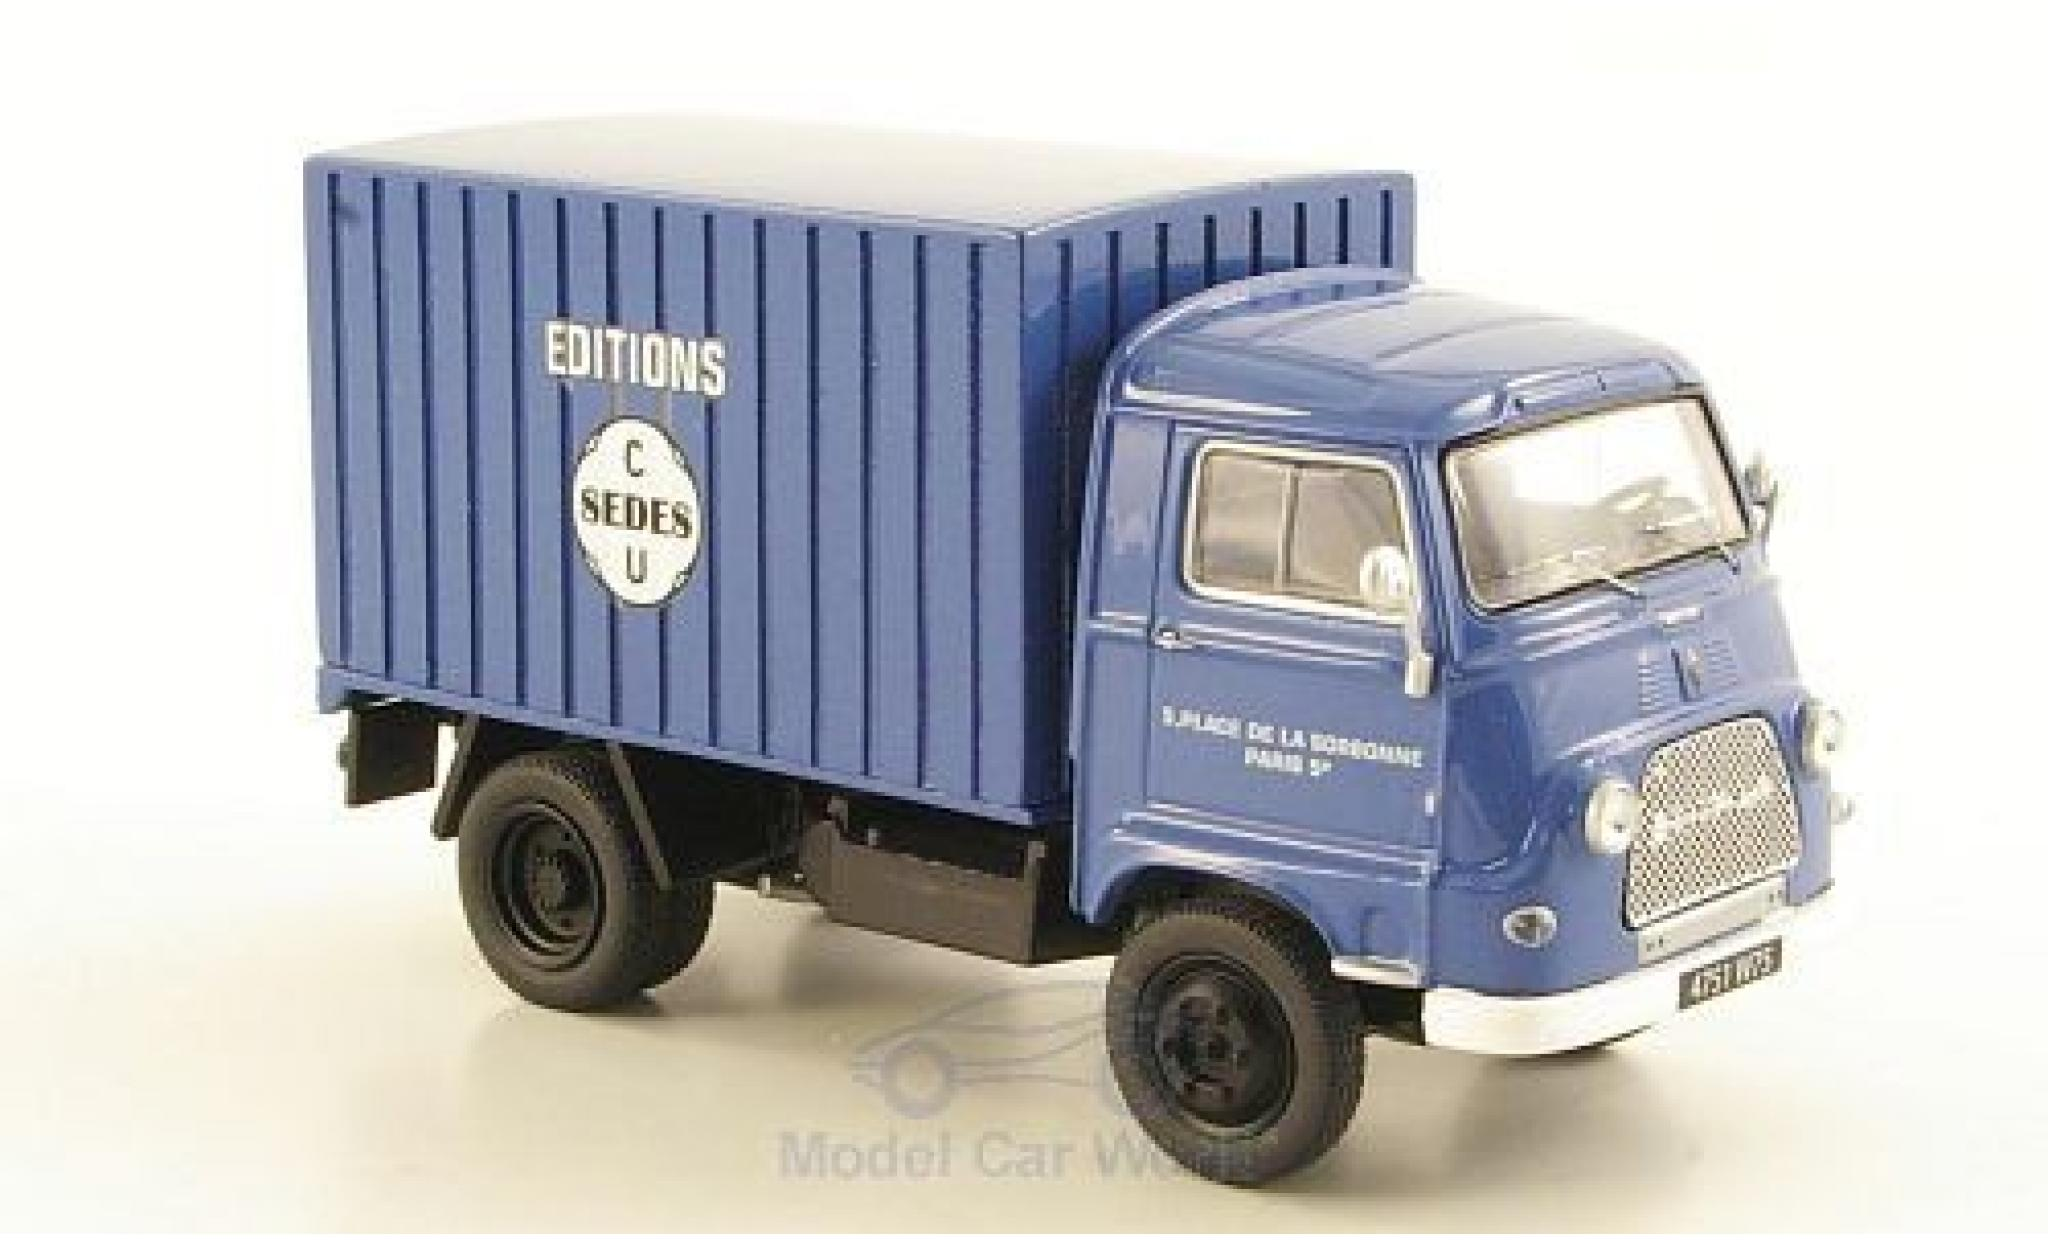 Sinpar Mini camion 1/43 Eligor Mini Camion Editions CDU Sedes